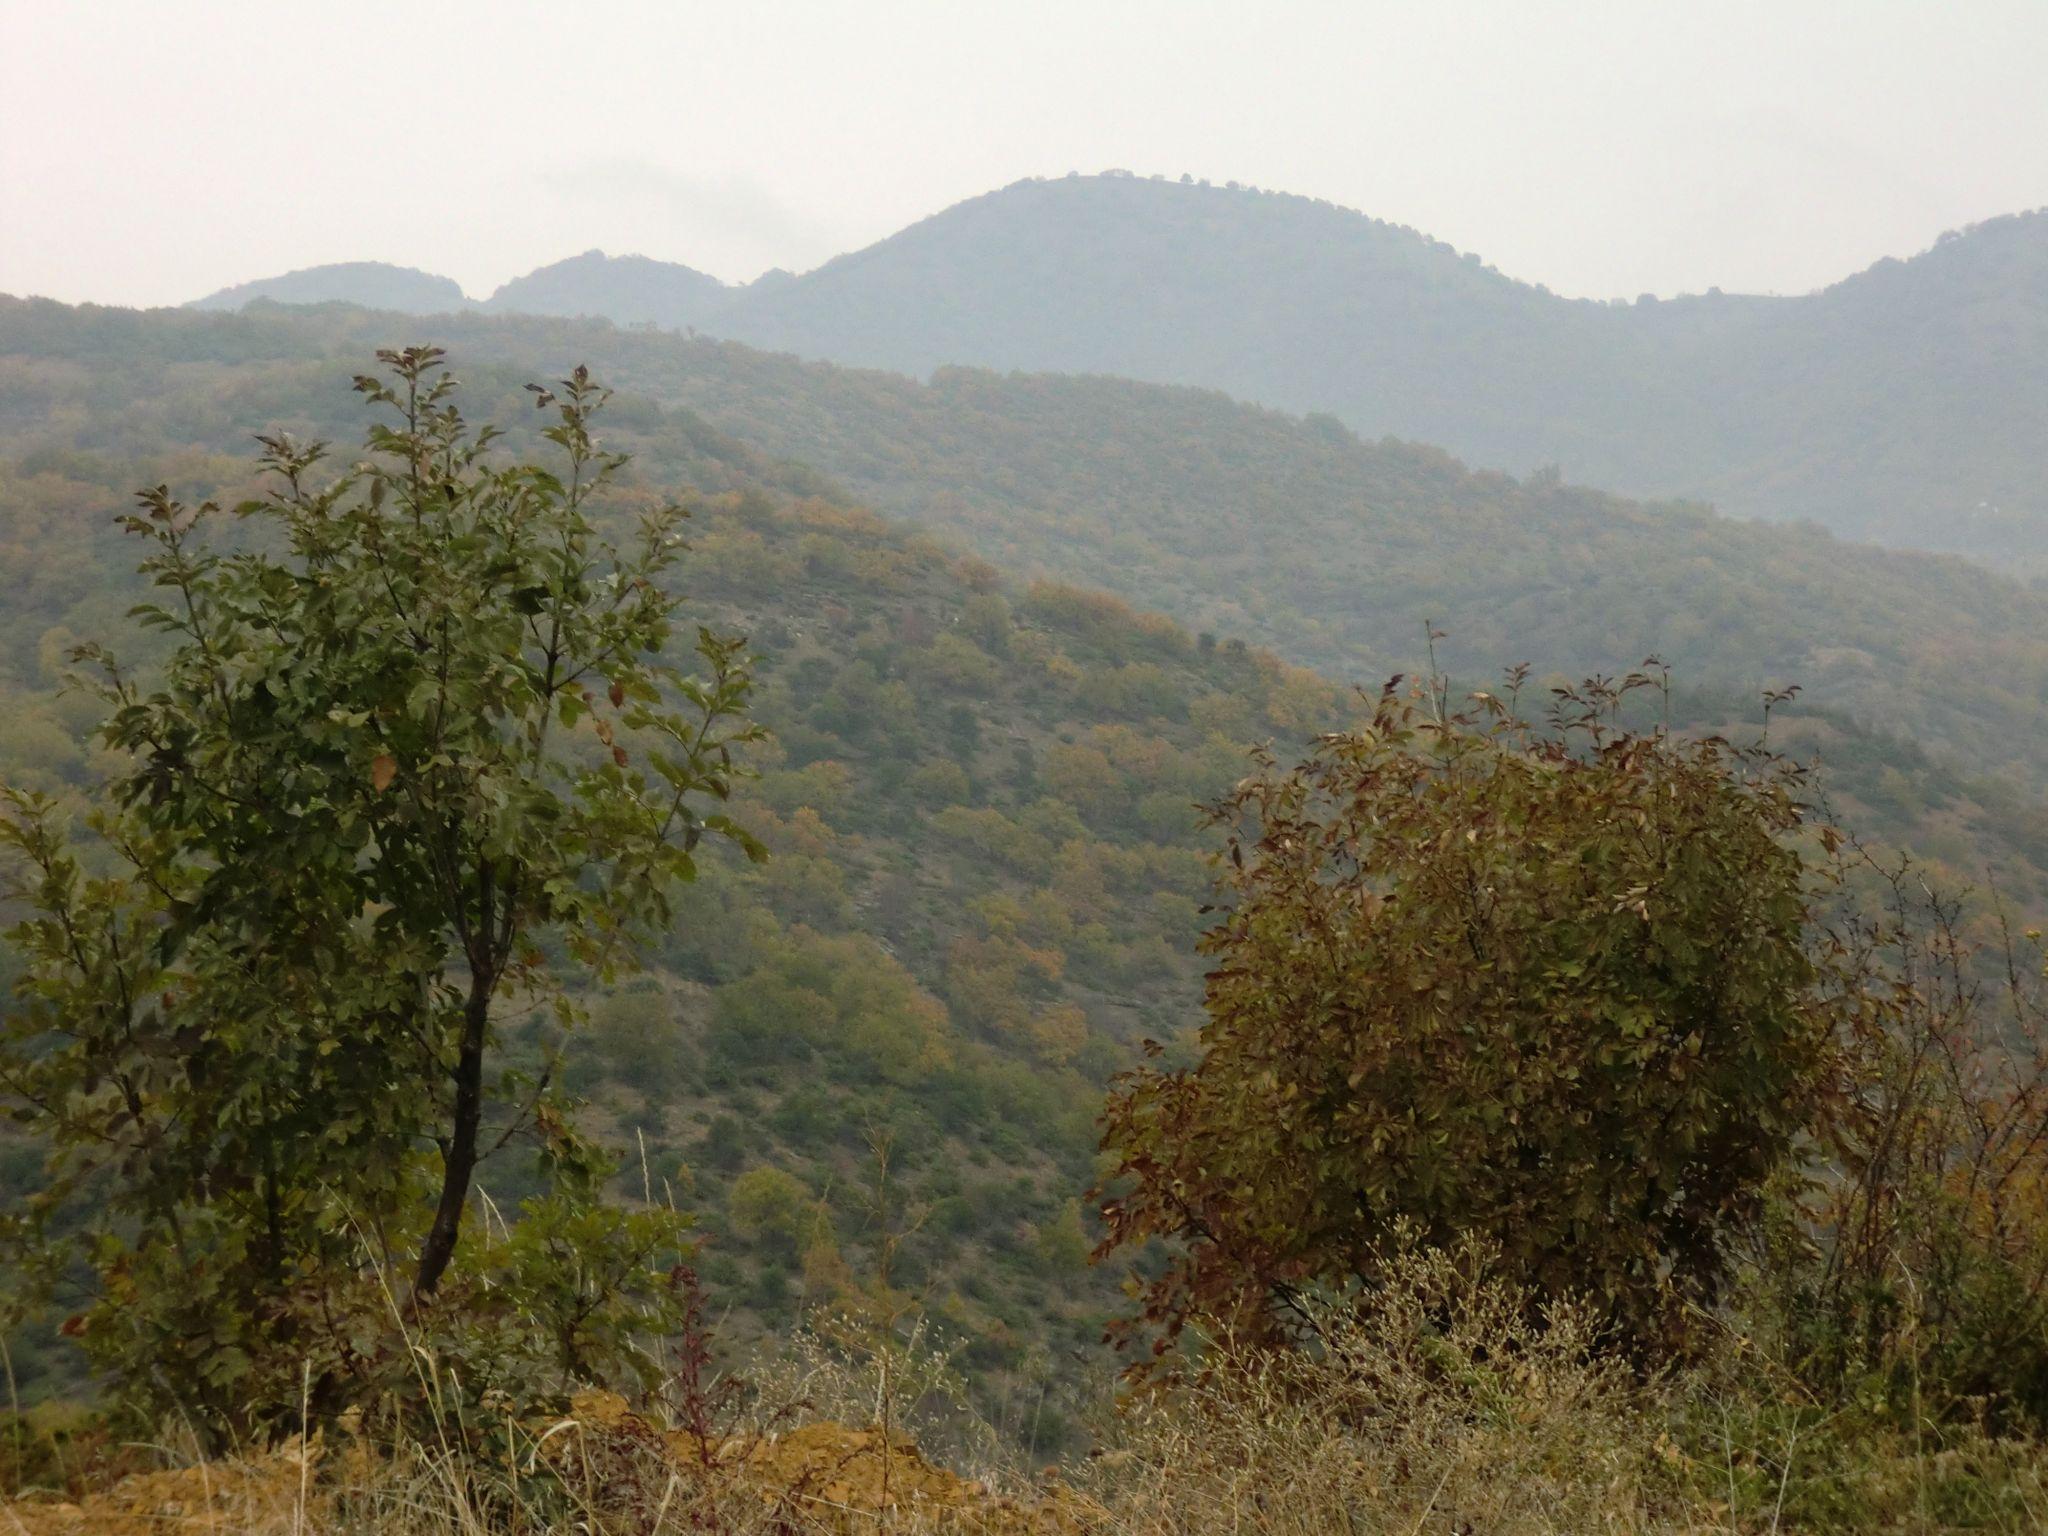 CIMG0289 - Macedonian landscapes